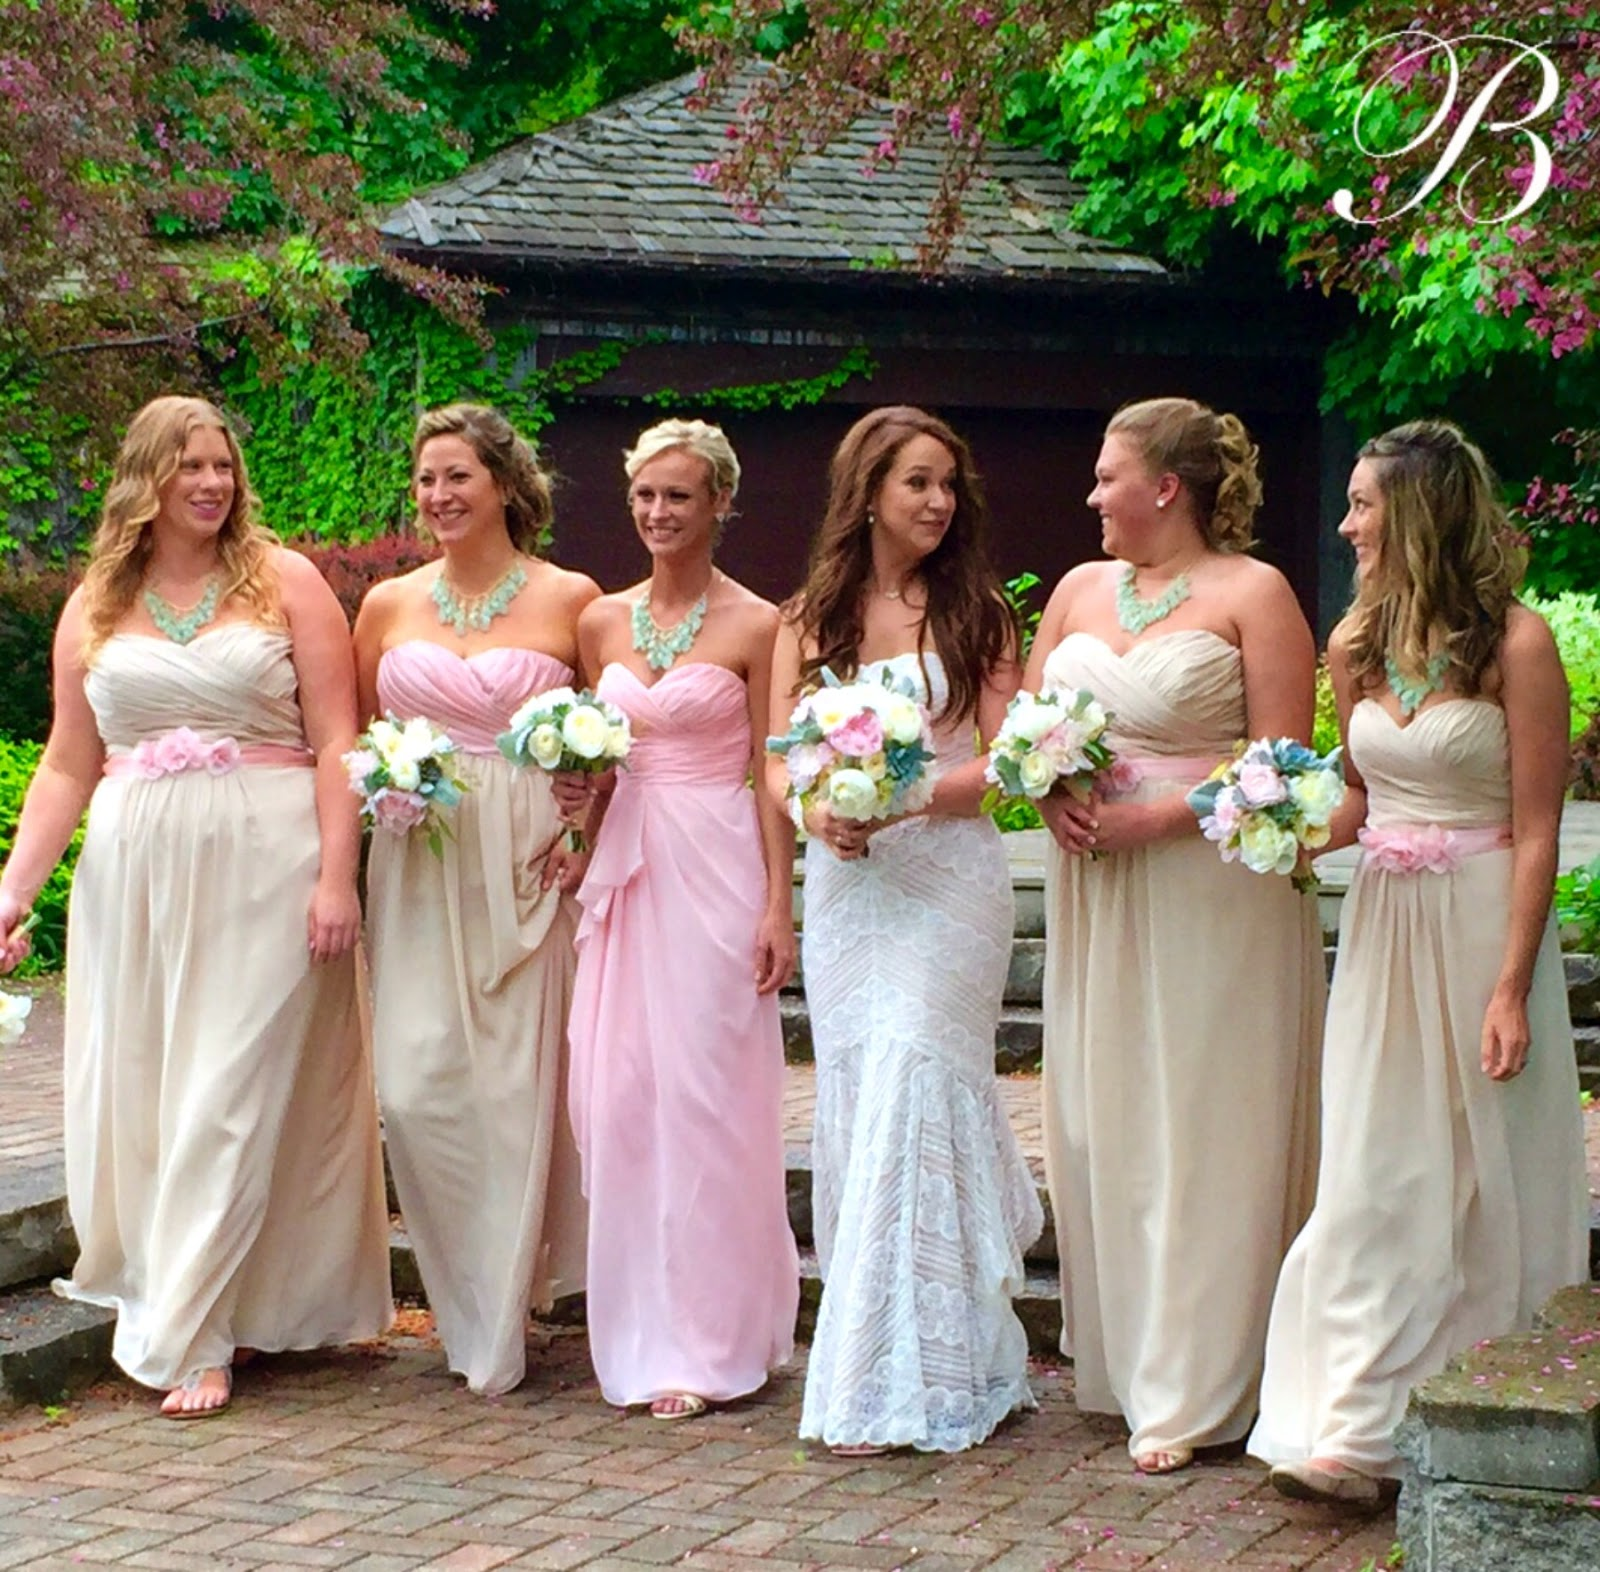 Rain On Your Wedding Day: Bank Of Flowers: Rain On Your Wedding Day Is A Day Of Luck